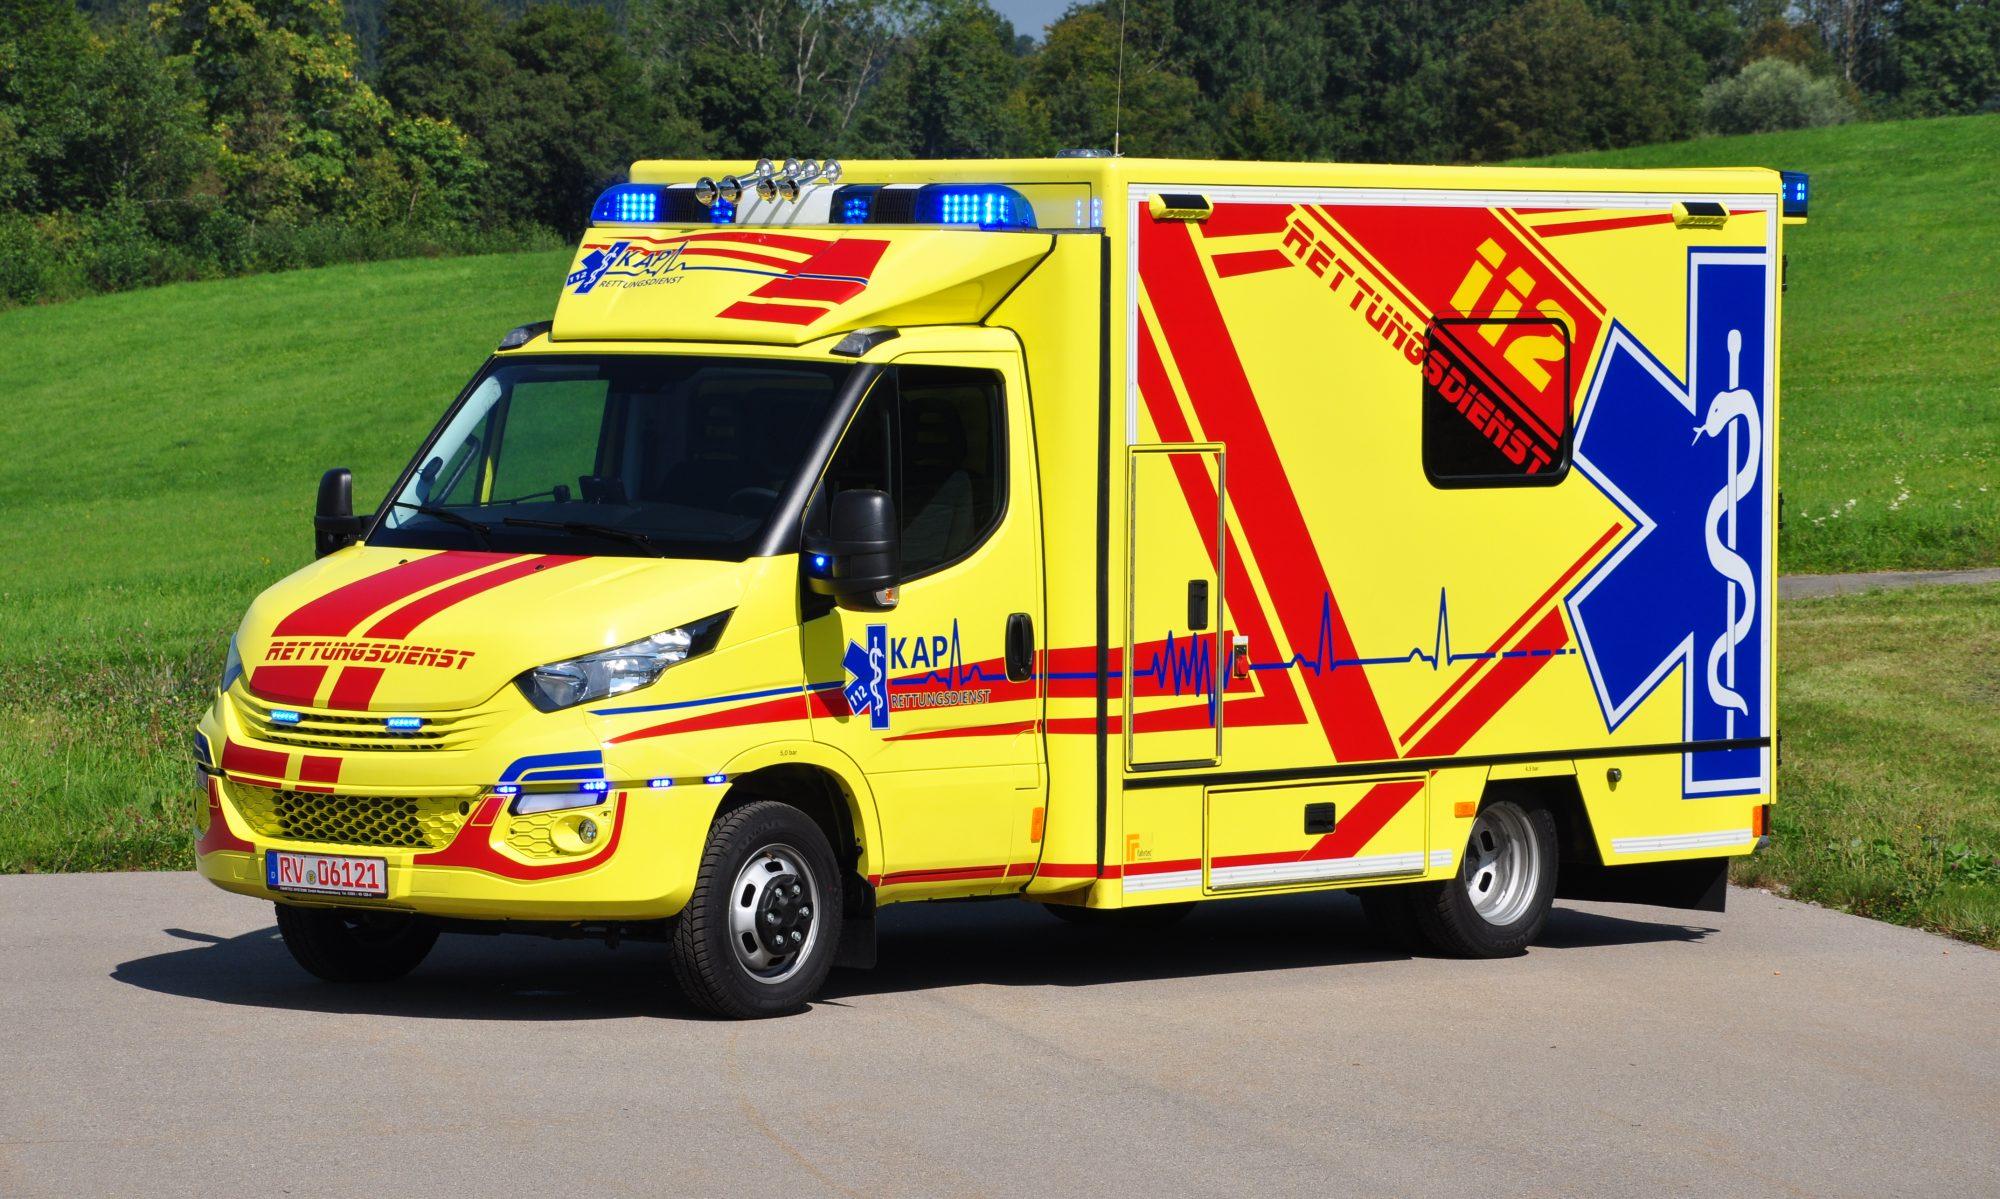 KAP Rettungsdienst